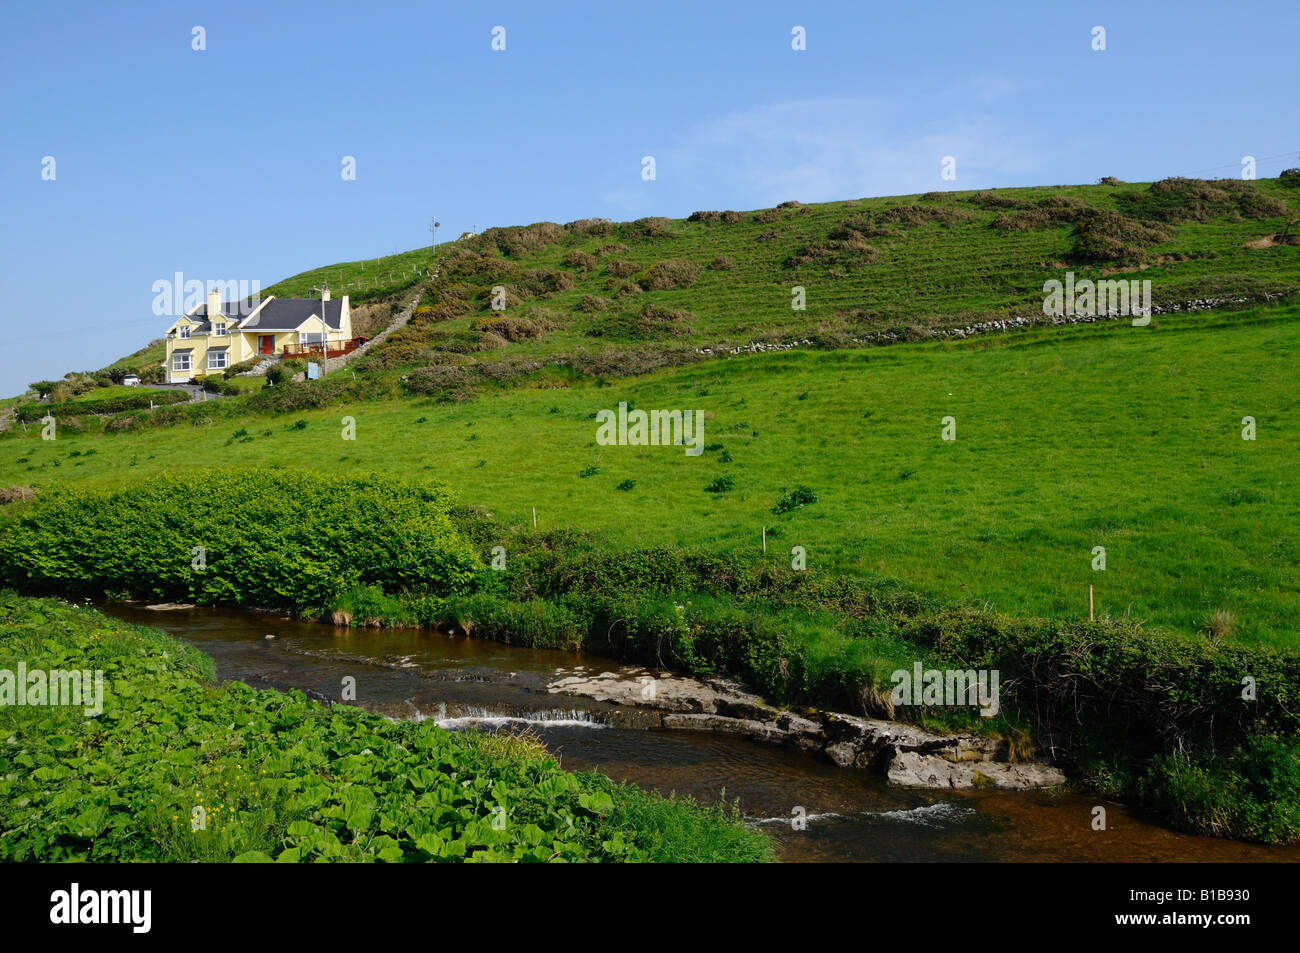 Green countryside of western Ireland. - Stock Image